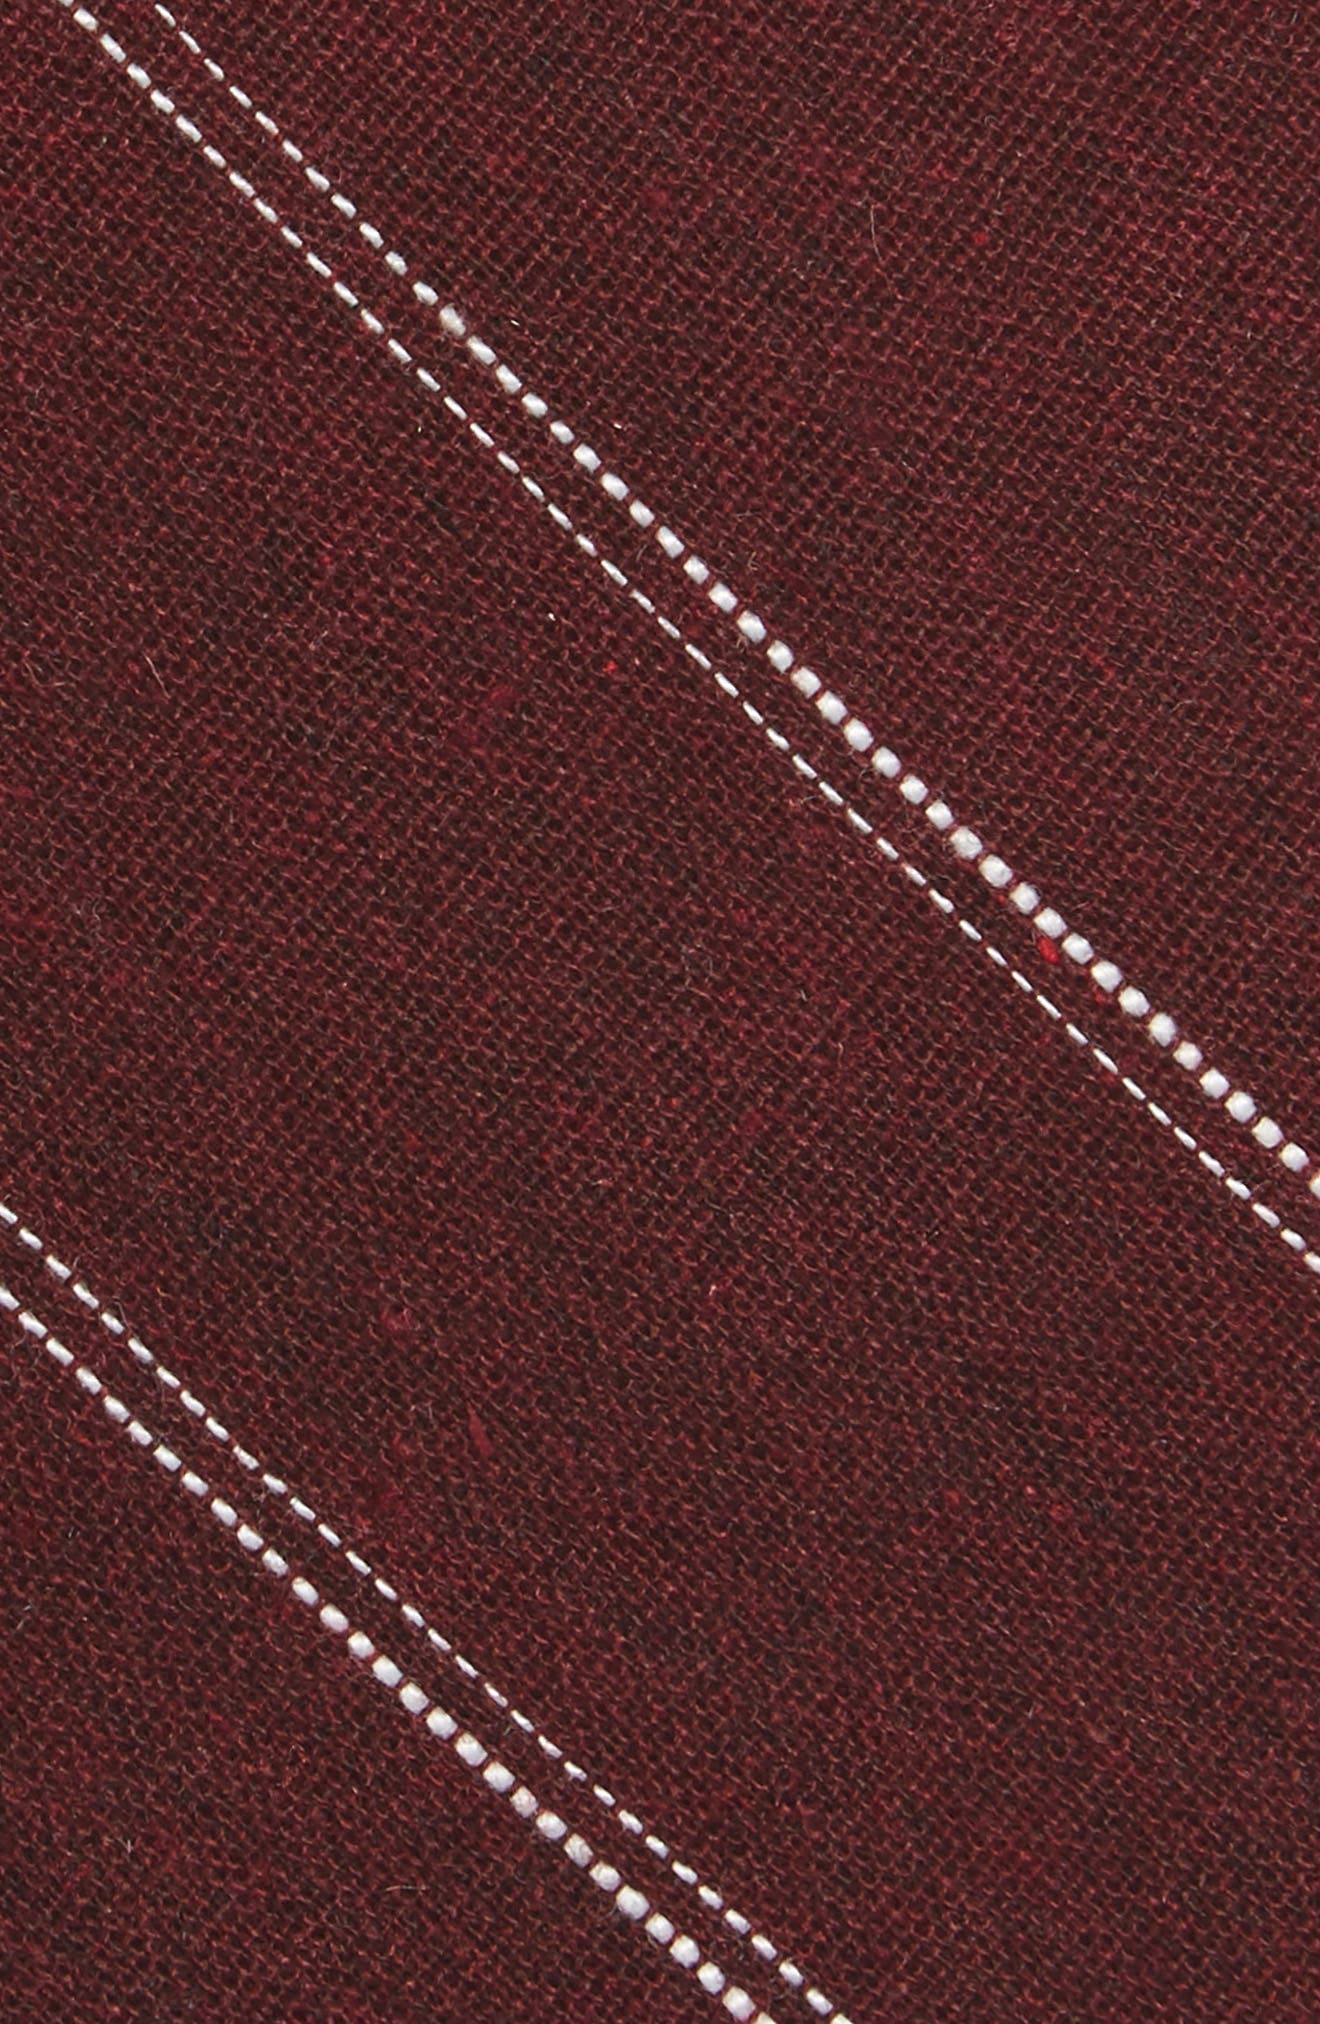 Alternate Image 2  - Nordstrom Men's Shop Palamino Stripe Cotton & Linen Skinny Tie